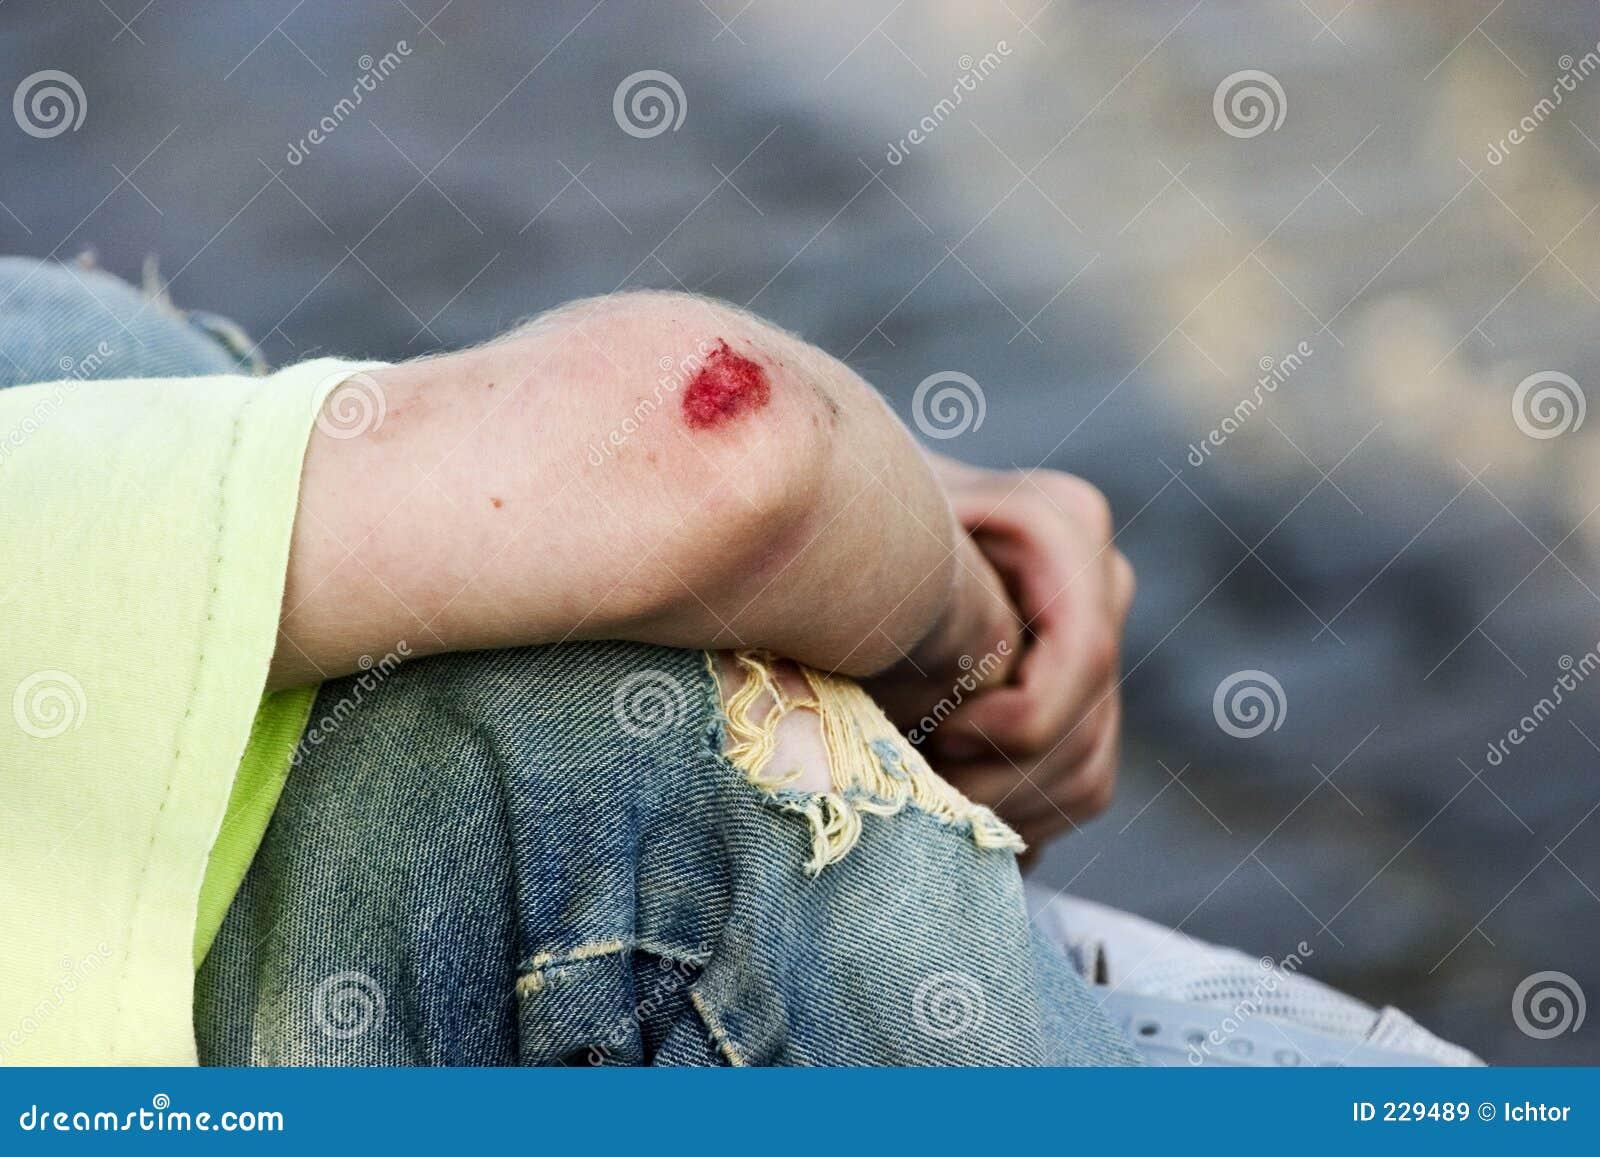 Bleeding Elbow Royalty Free Stock Images Image 229489